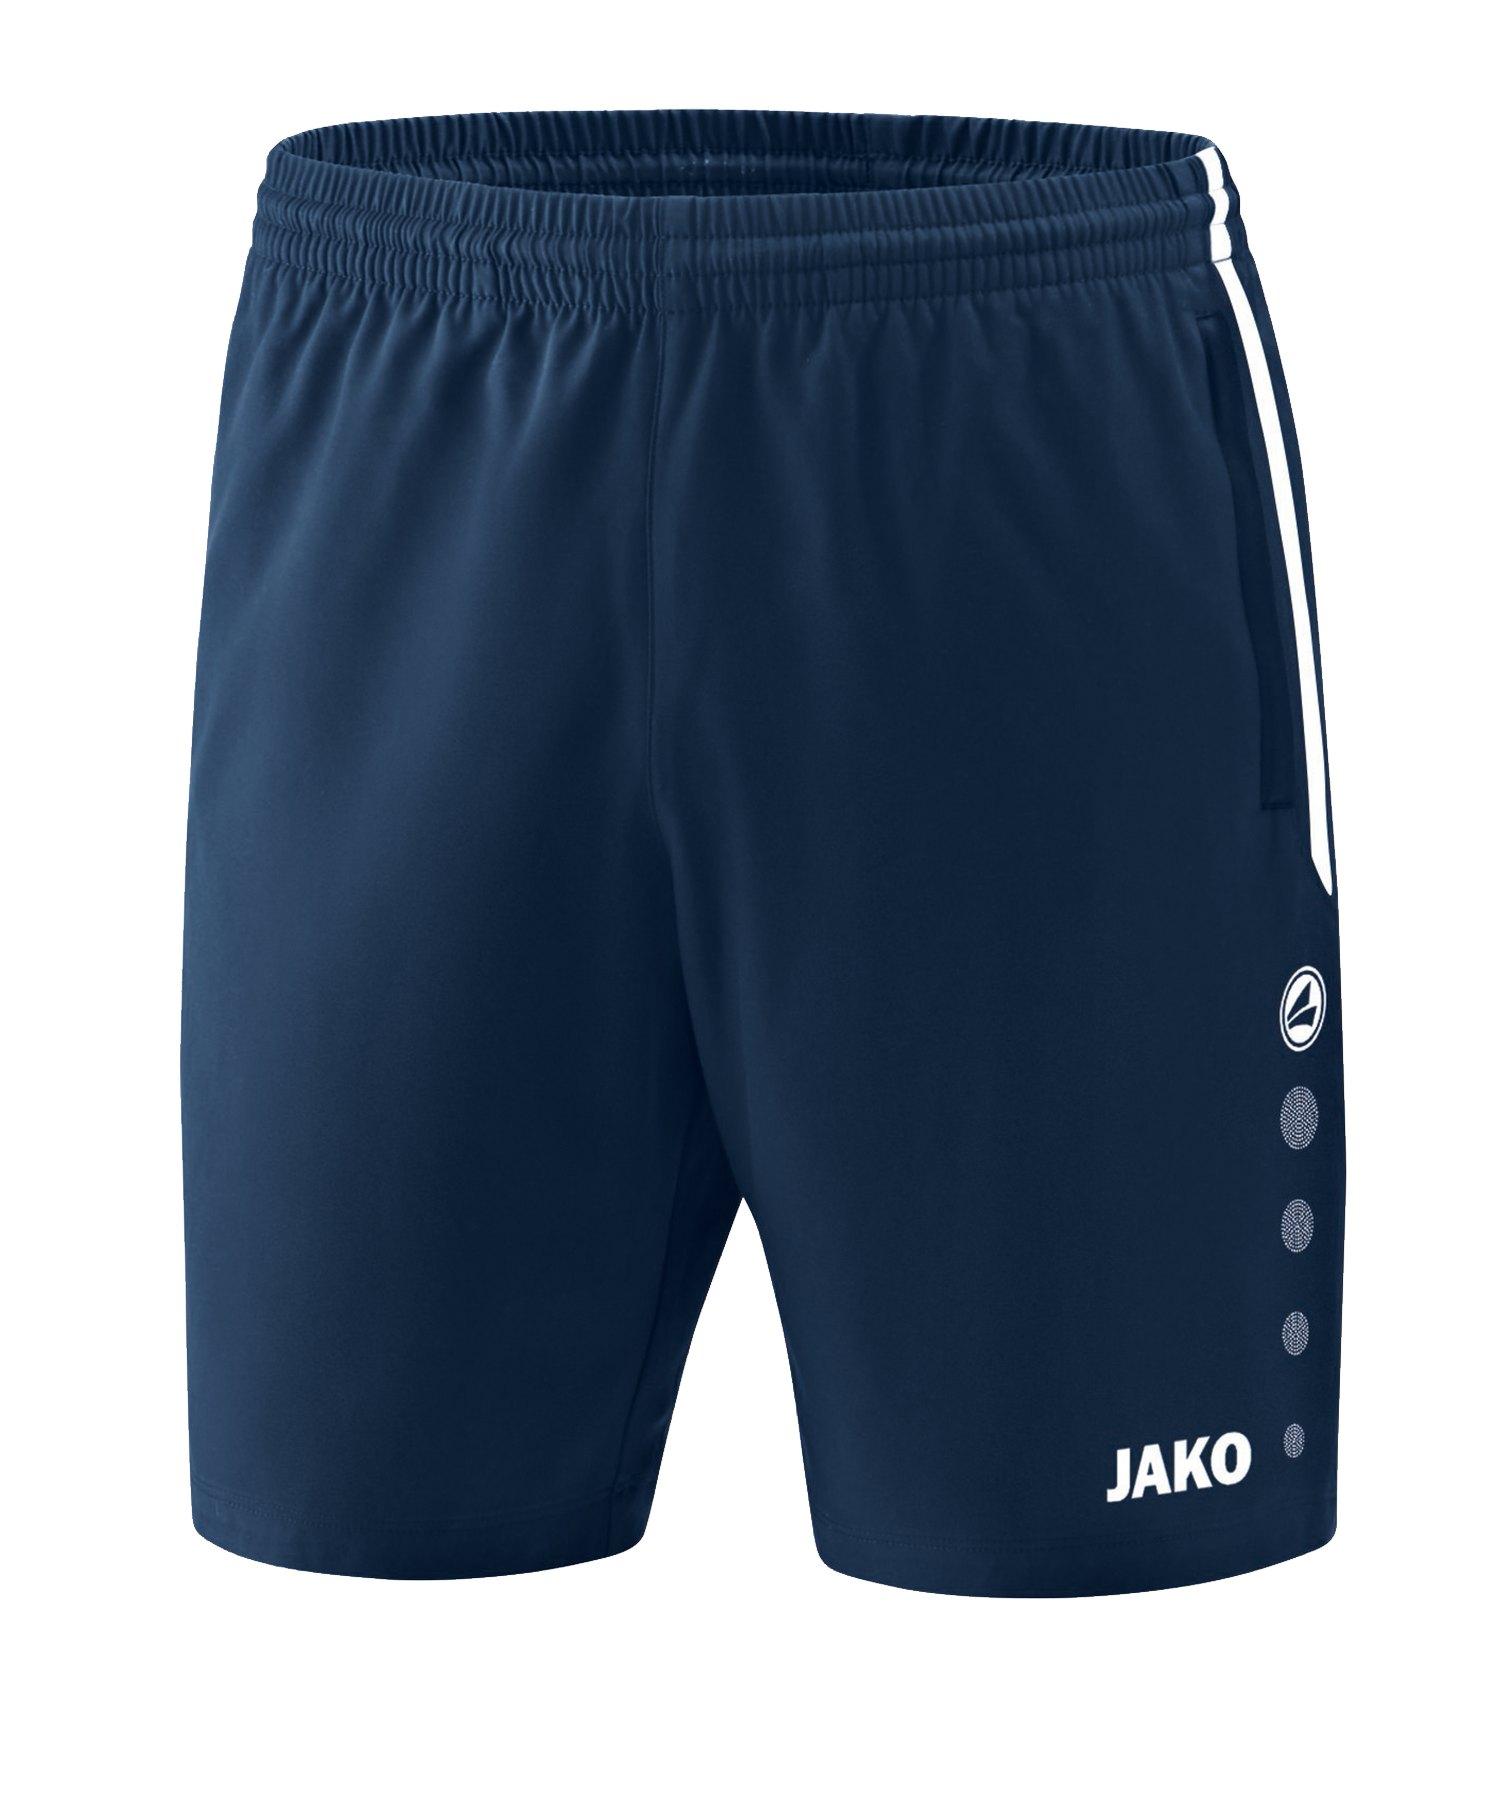 Jako Competition 2.0 Short Damen Blau F09 - blau